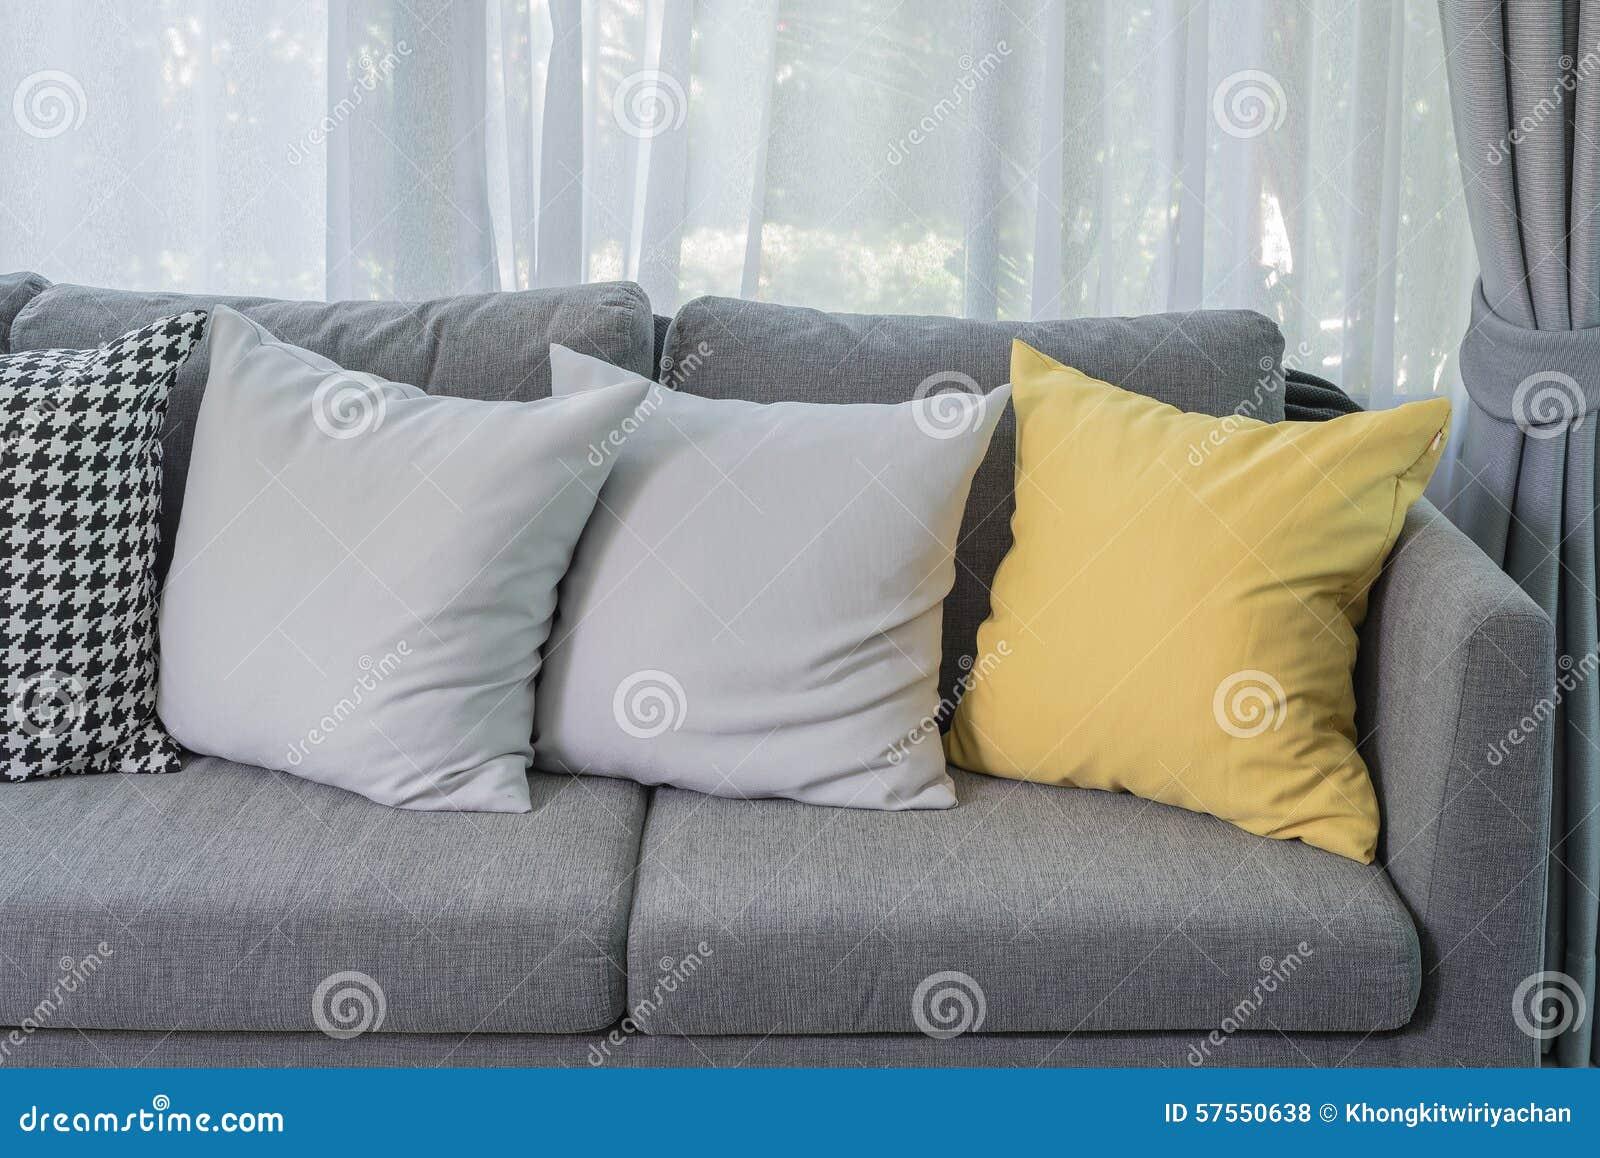 Geel hoofdkussen op grijze bank in moderne woonkamer stock foto ...